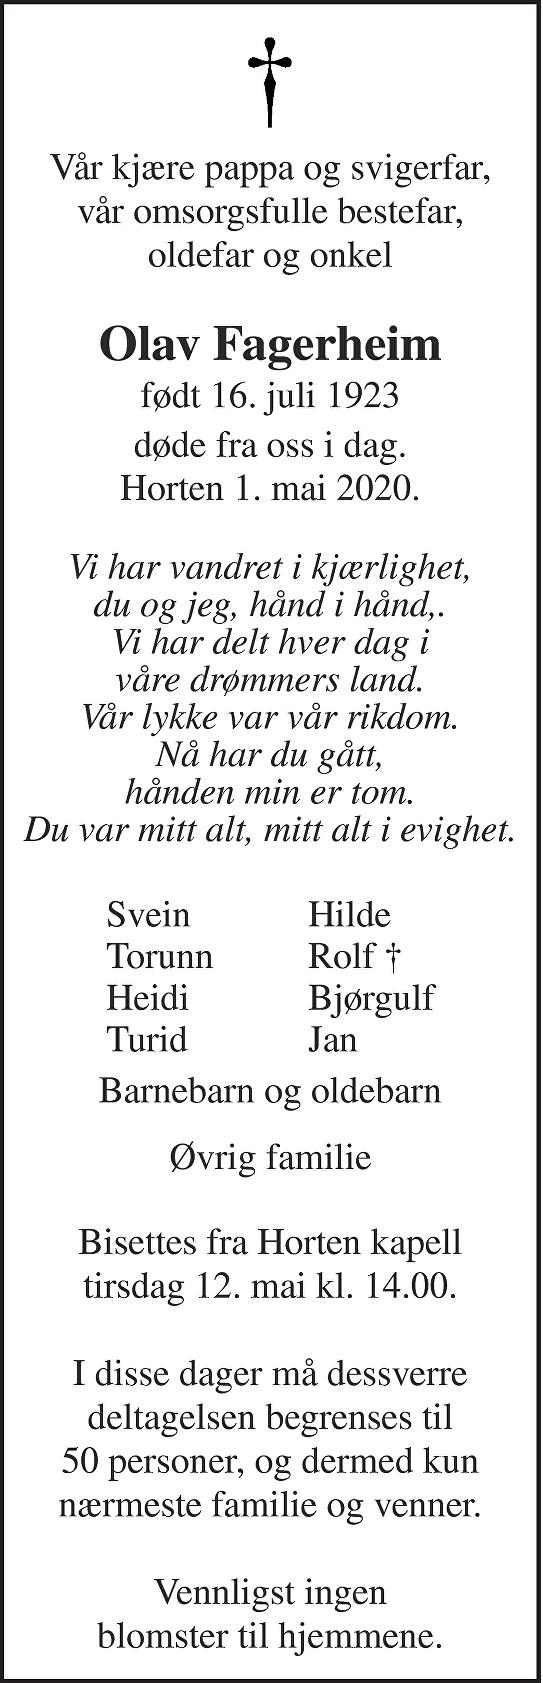 Olav Fagerheim Dødsannonse